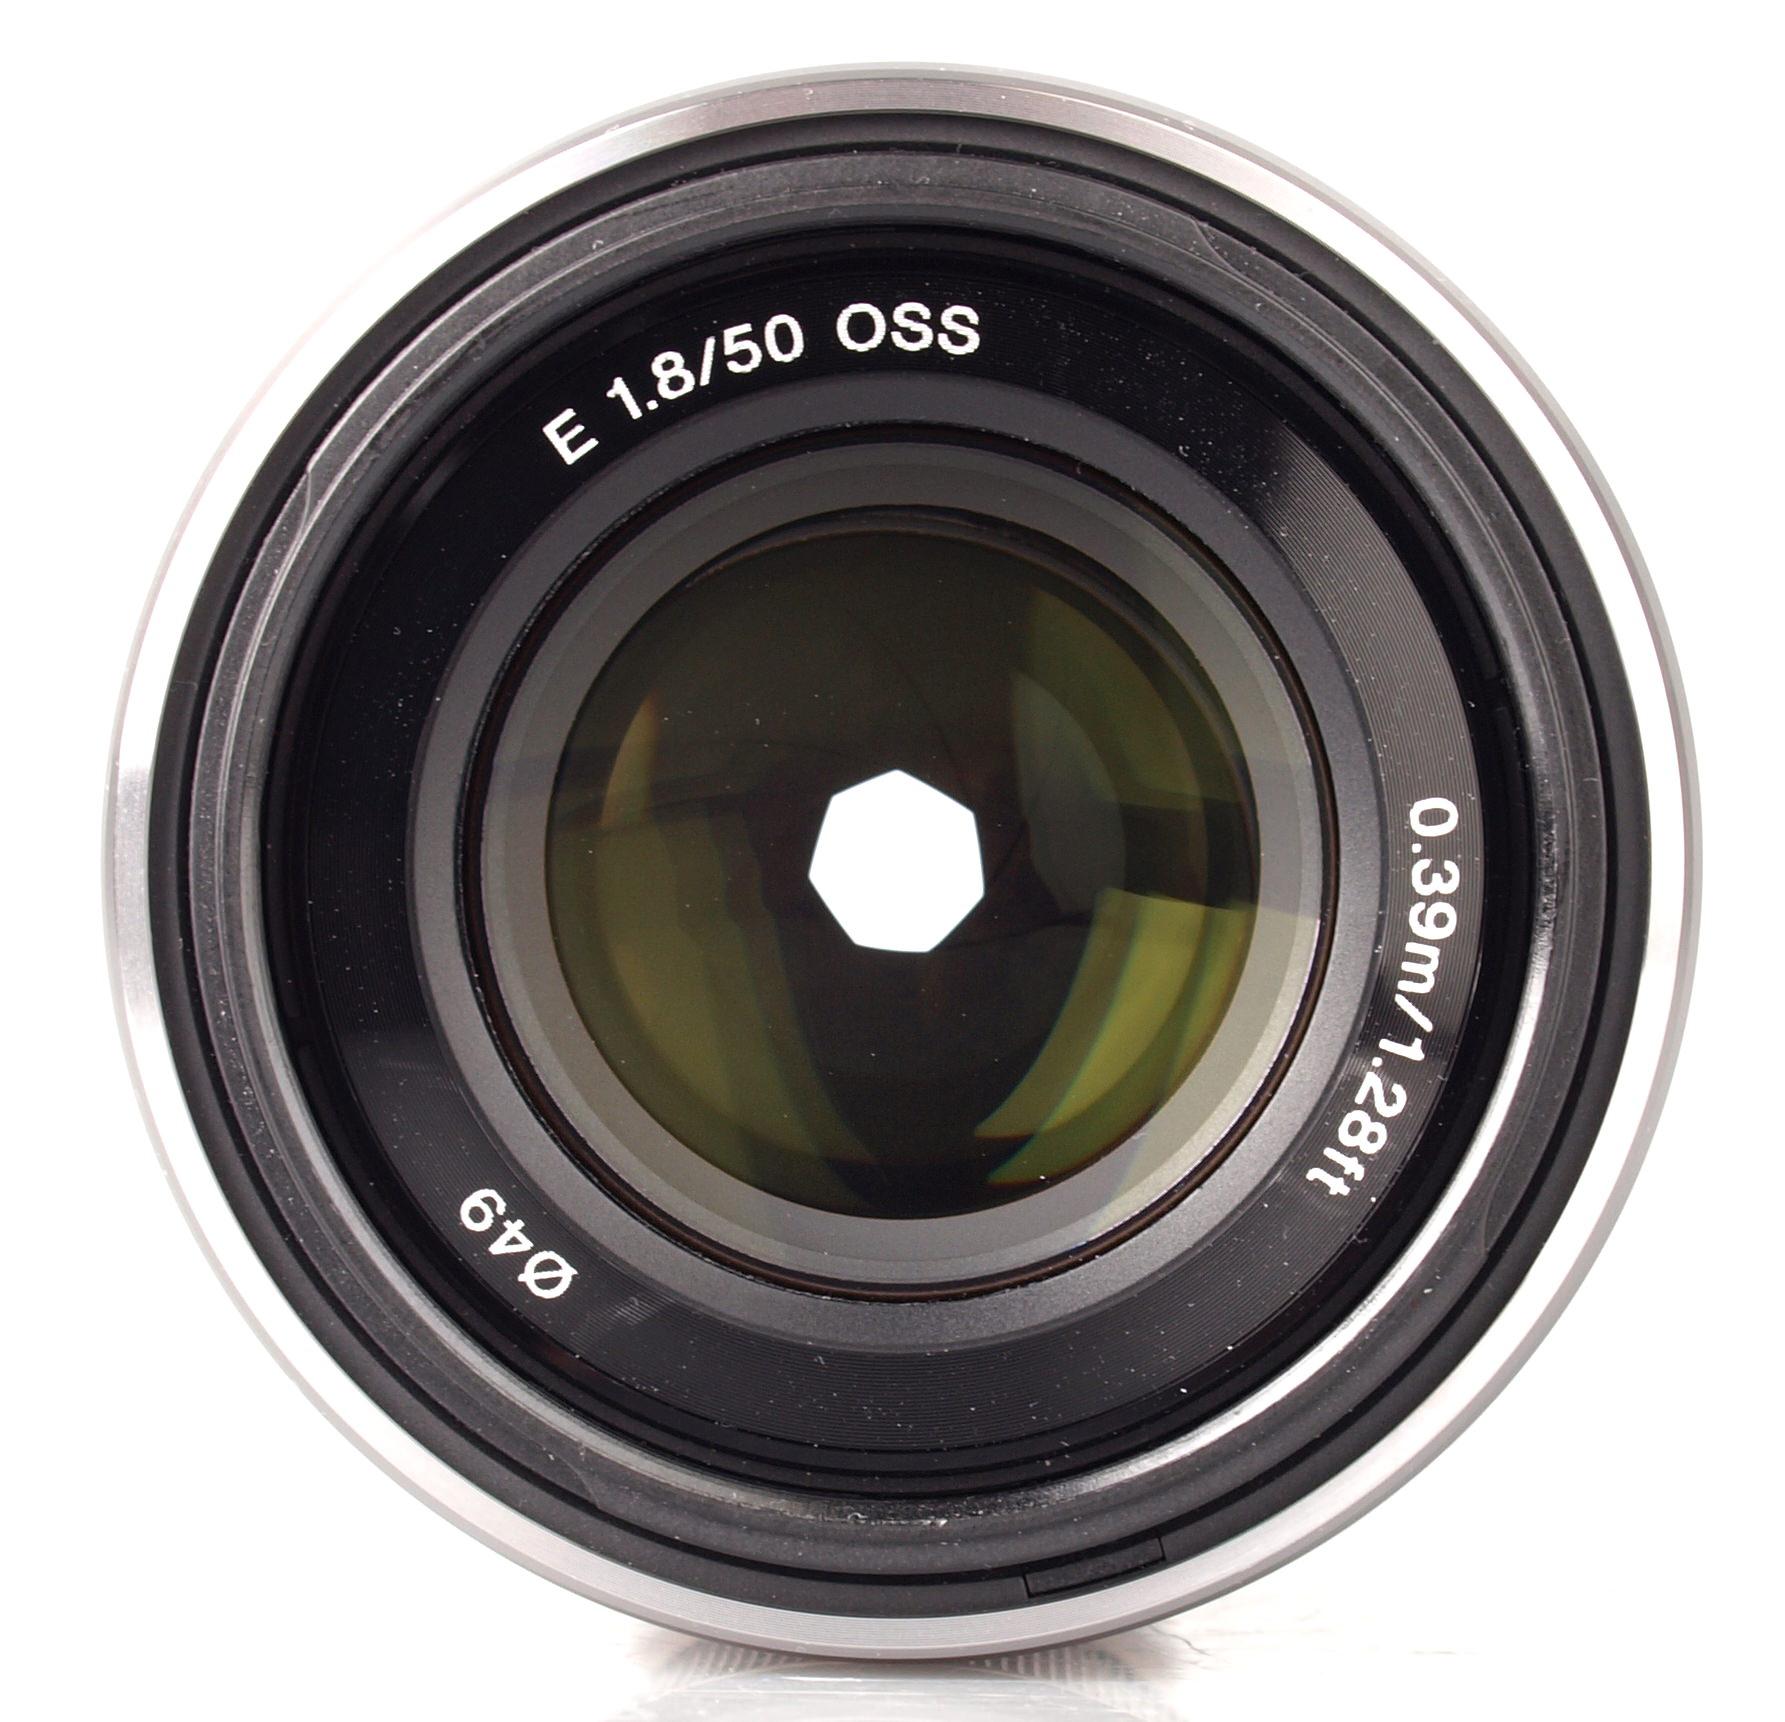 Sony NEX 50mm f/1.8 OS...